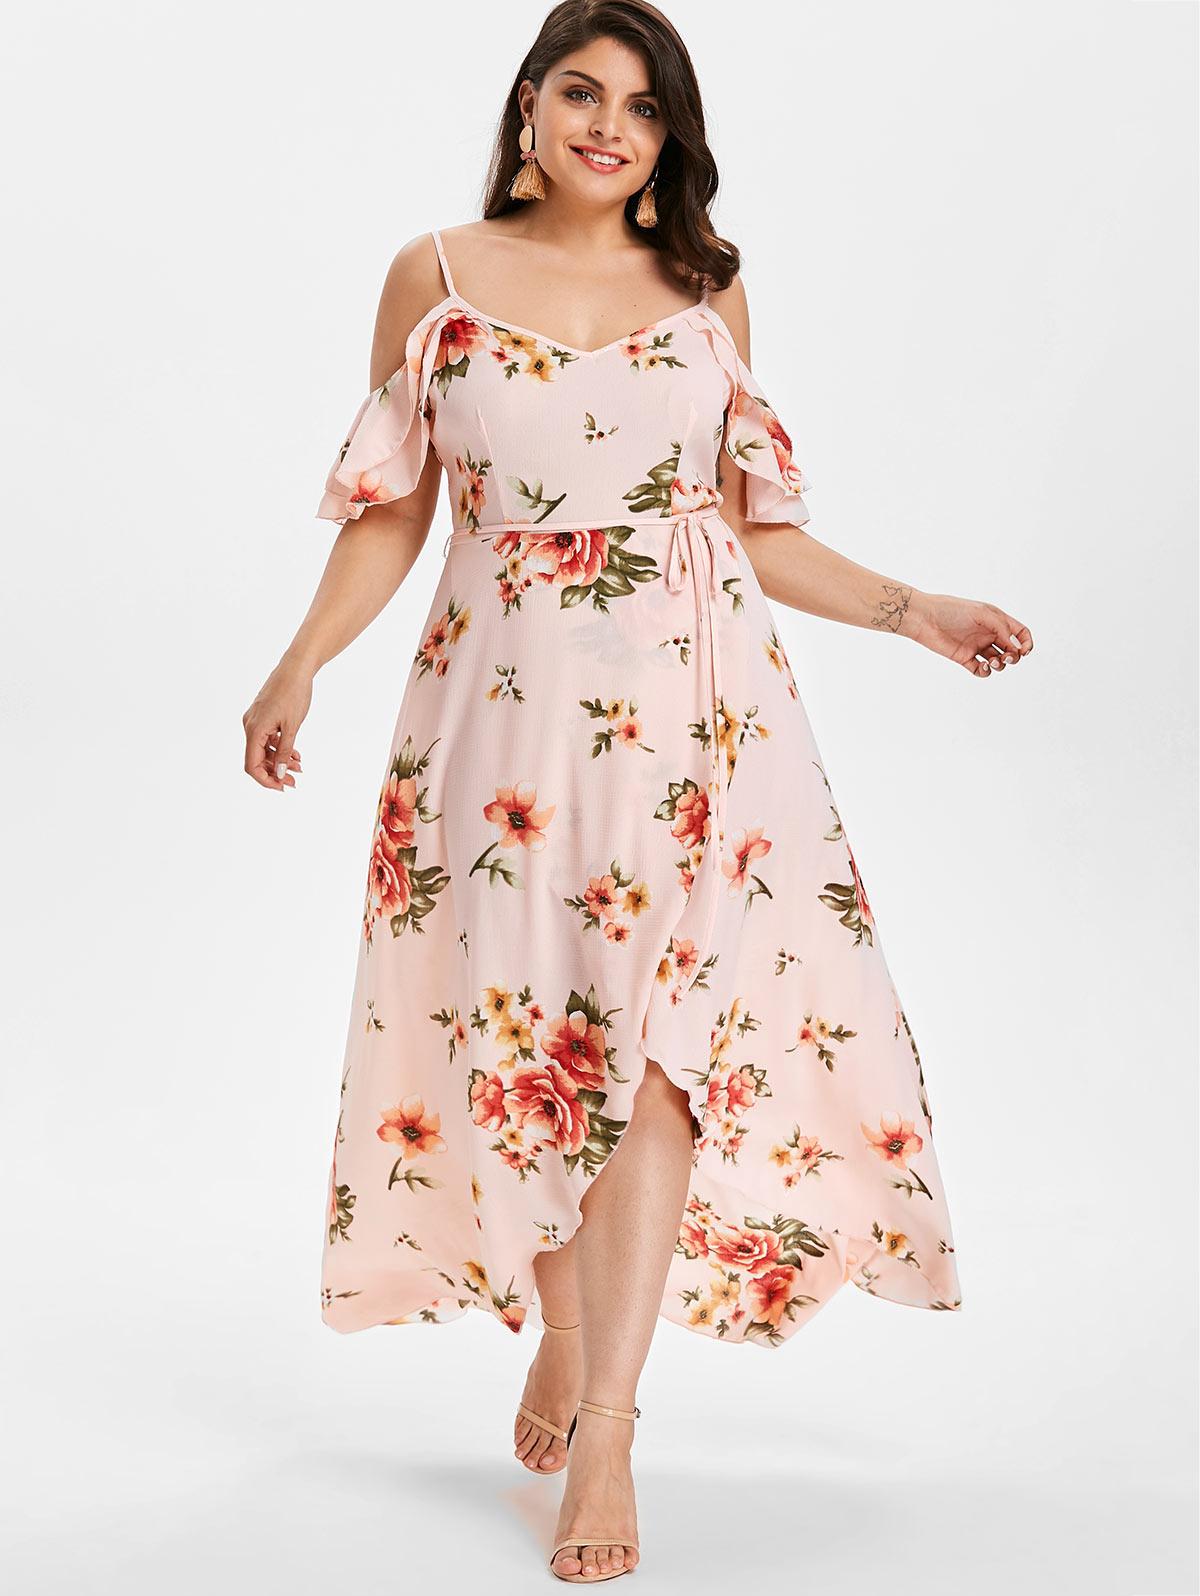 US $13.48 50% OFF|Wipalo Plus Size Women Spaghetti Strap Half Sleeves  Floral Print Dresses Cold Shoulder Belt Overlap Dress Bohemian Beach  Dress-in ...